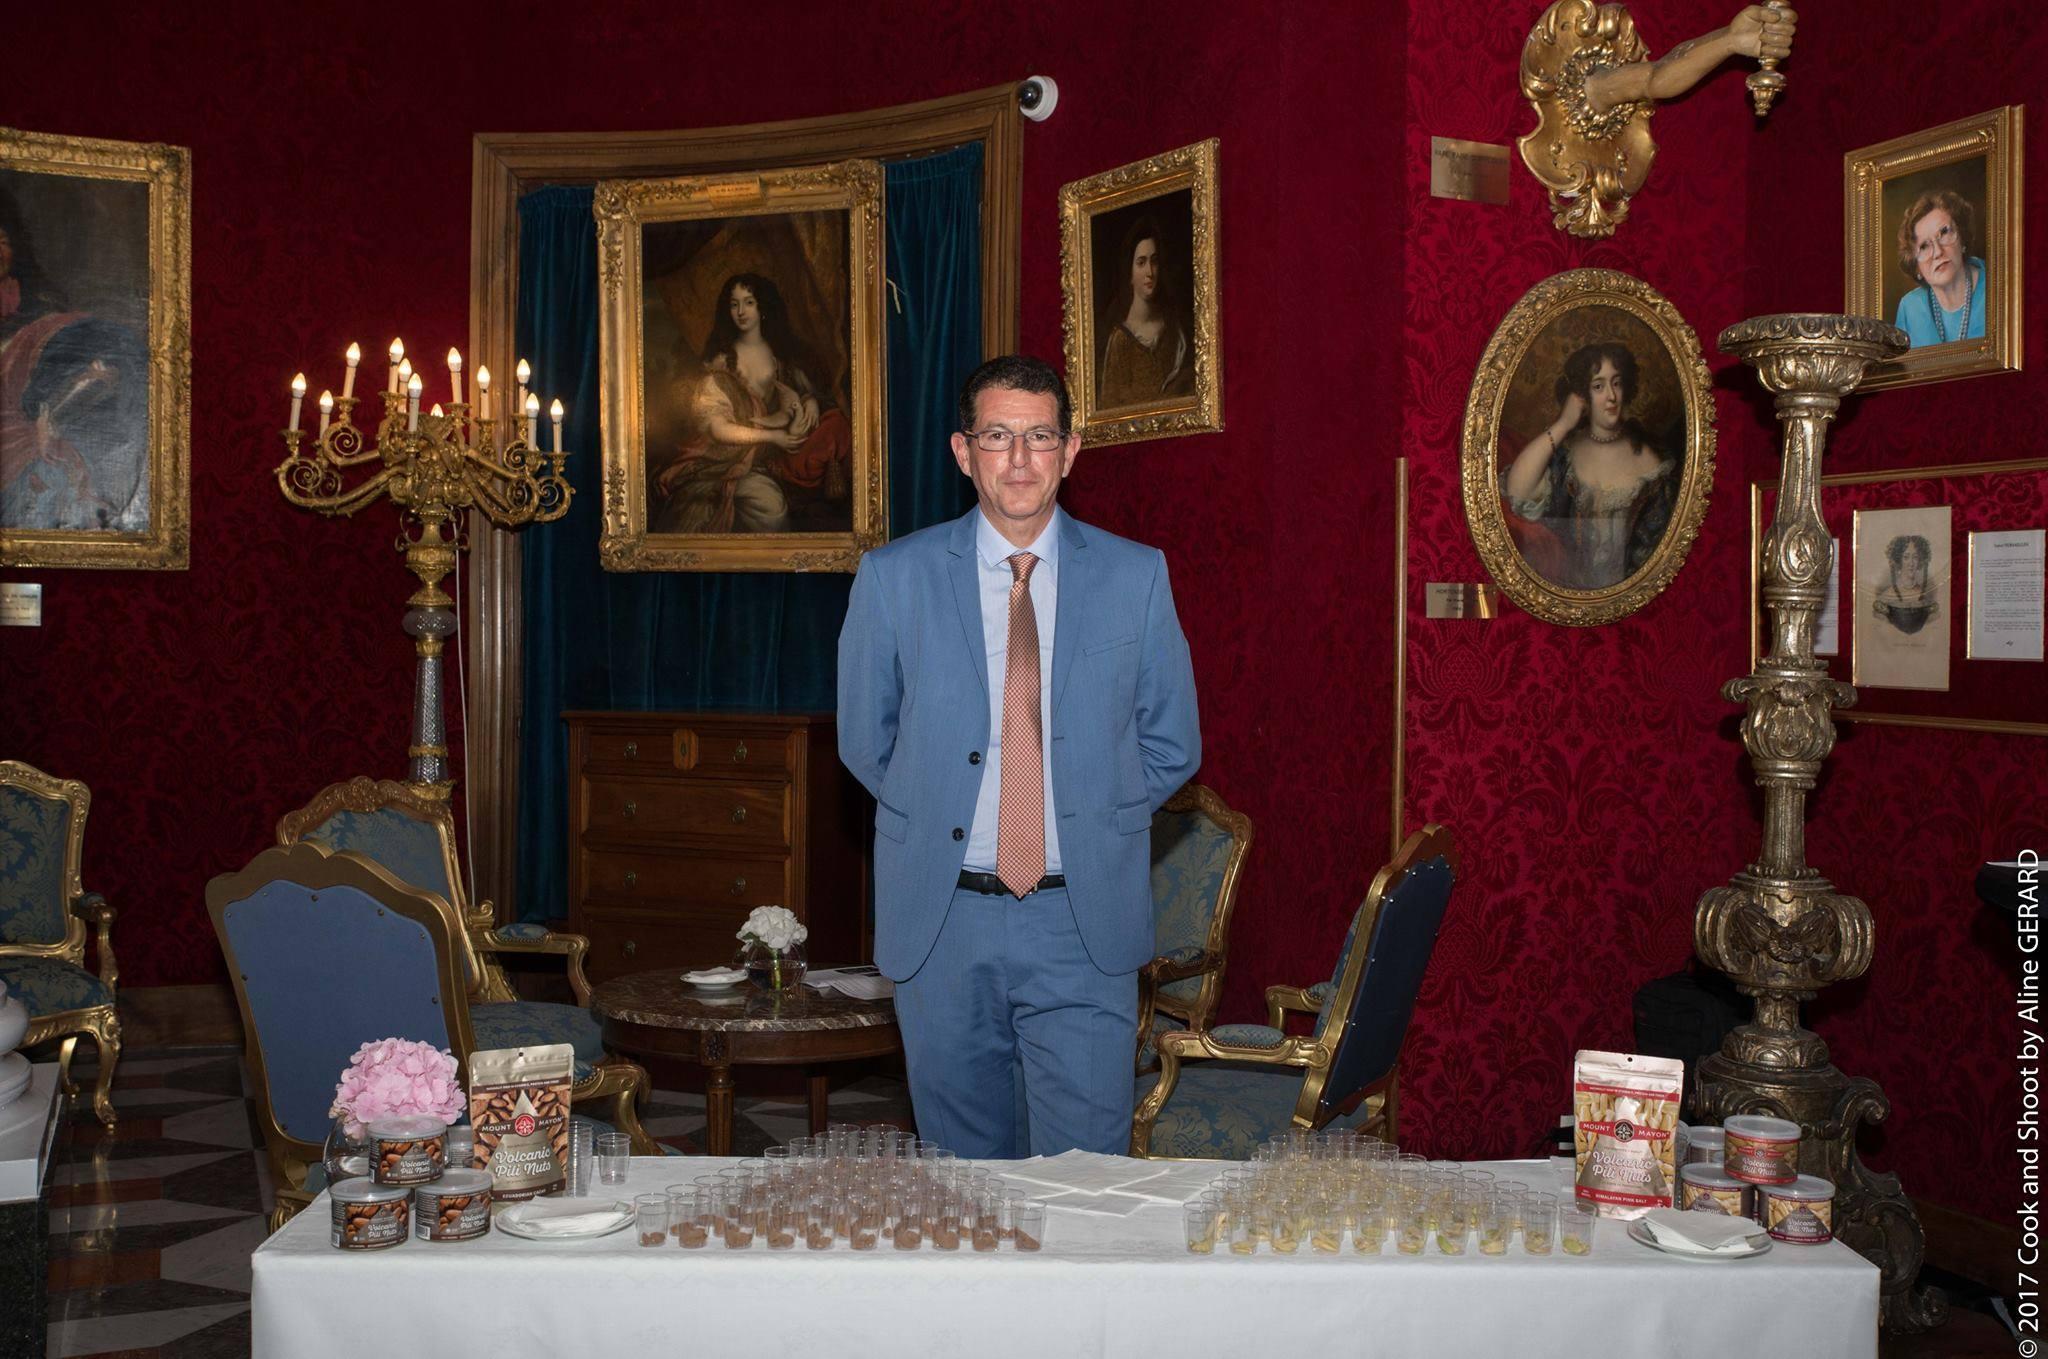 Meilleurs Ouvriers de France Cote d'Azur 2017 Gala Dinner and Mount Mayon Pili Nuts